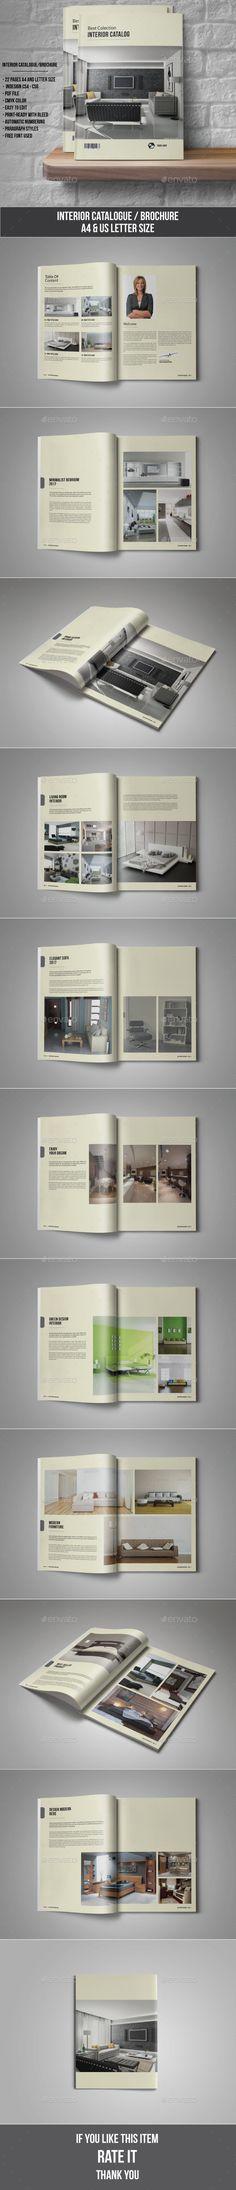 Interior Catalogue / Brochure Template InDesign INDD #design Download: http://graphicriver.net/item/interior-catalogue-brochure/13985172?ref=ksioks